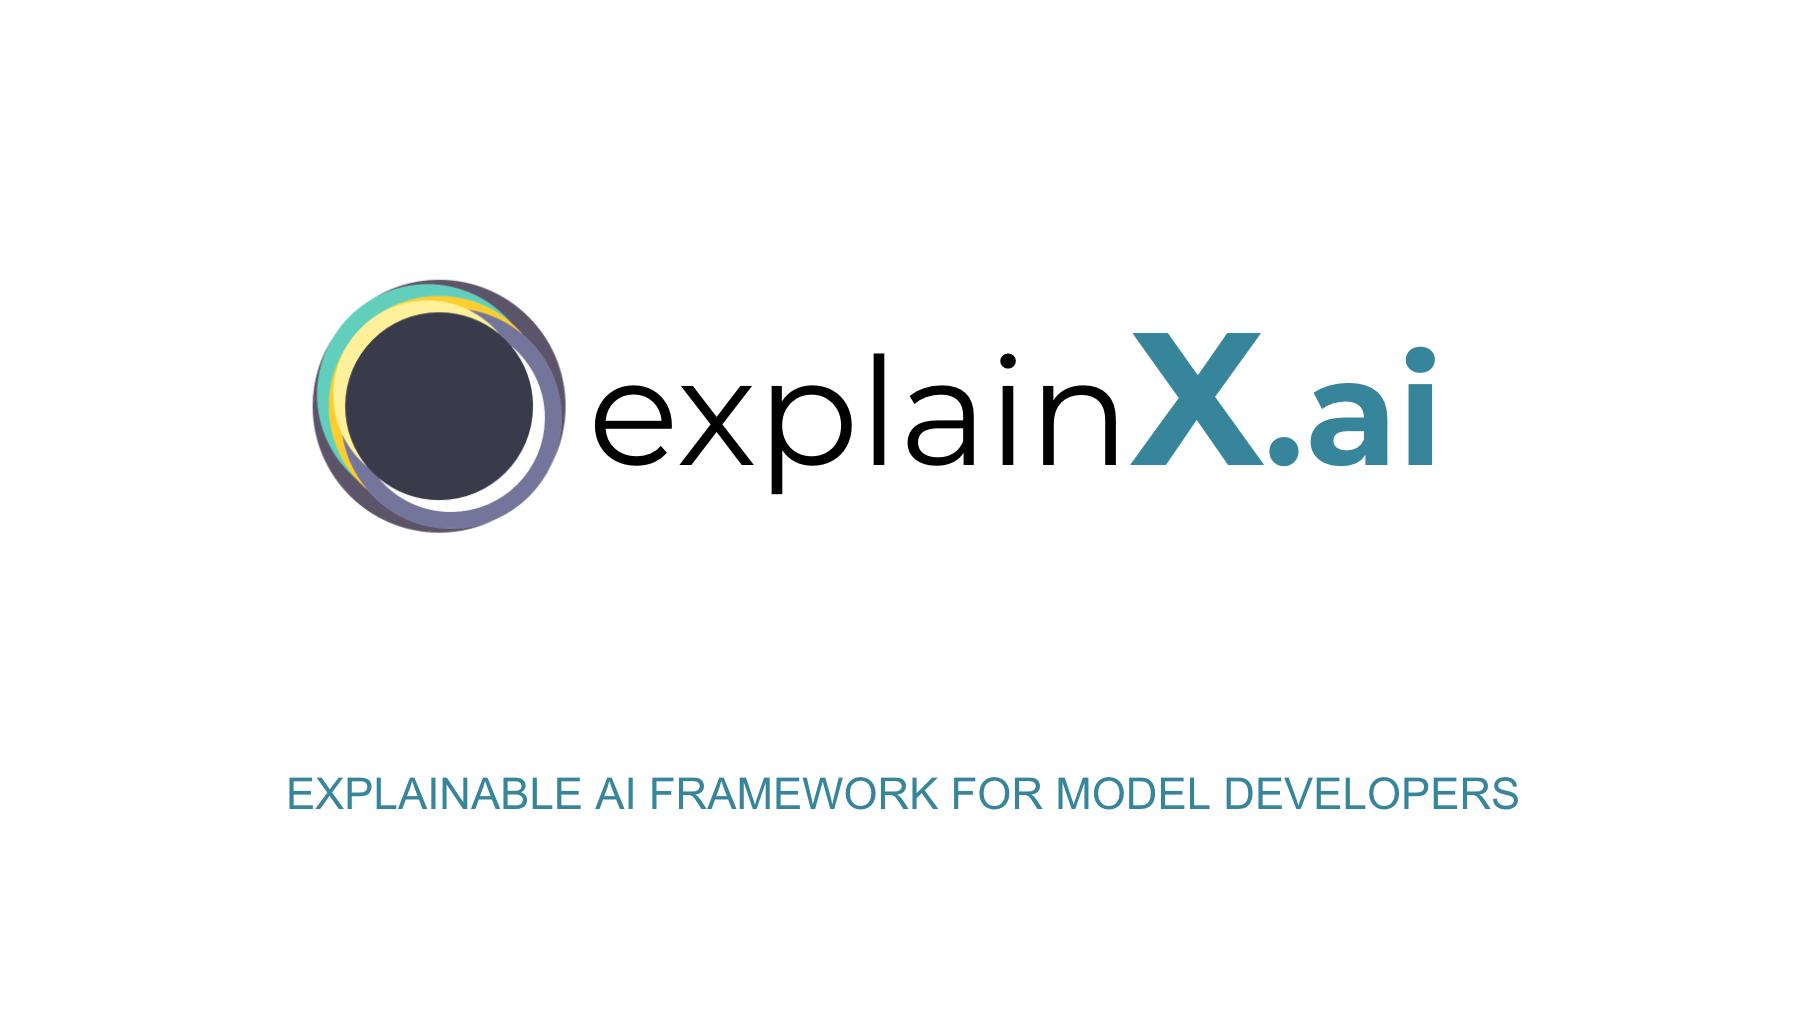 explainx